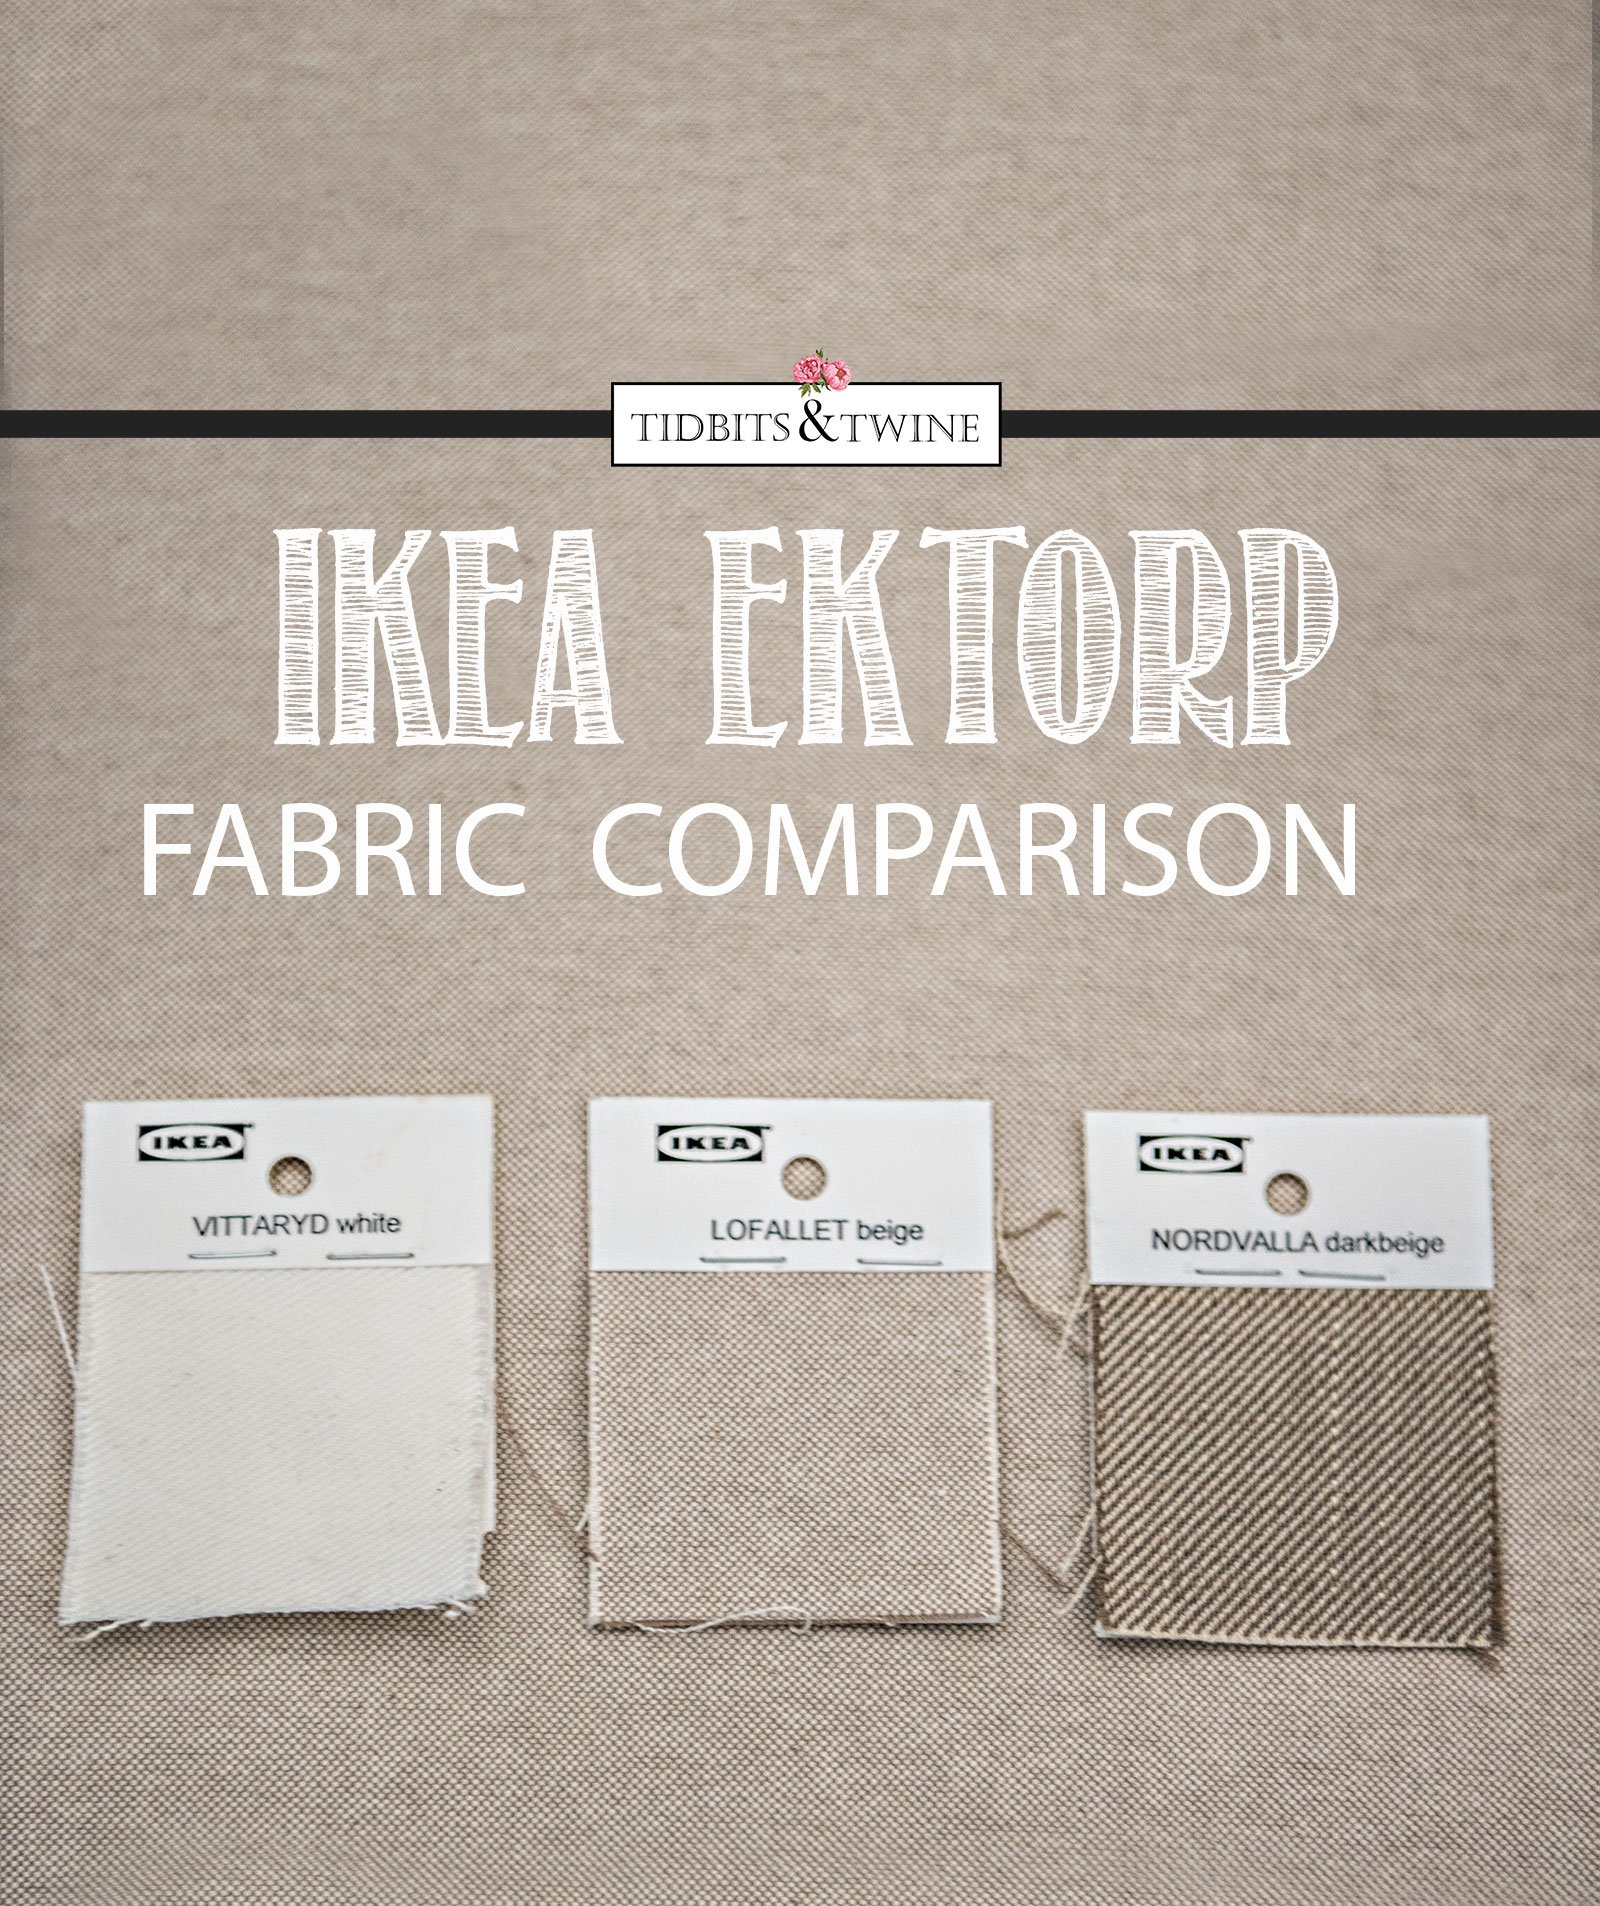 IKEA EKTORP Lofallet Beige versus Vittaryd White and Nordvalla dark beige